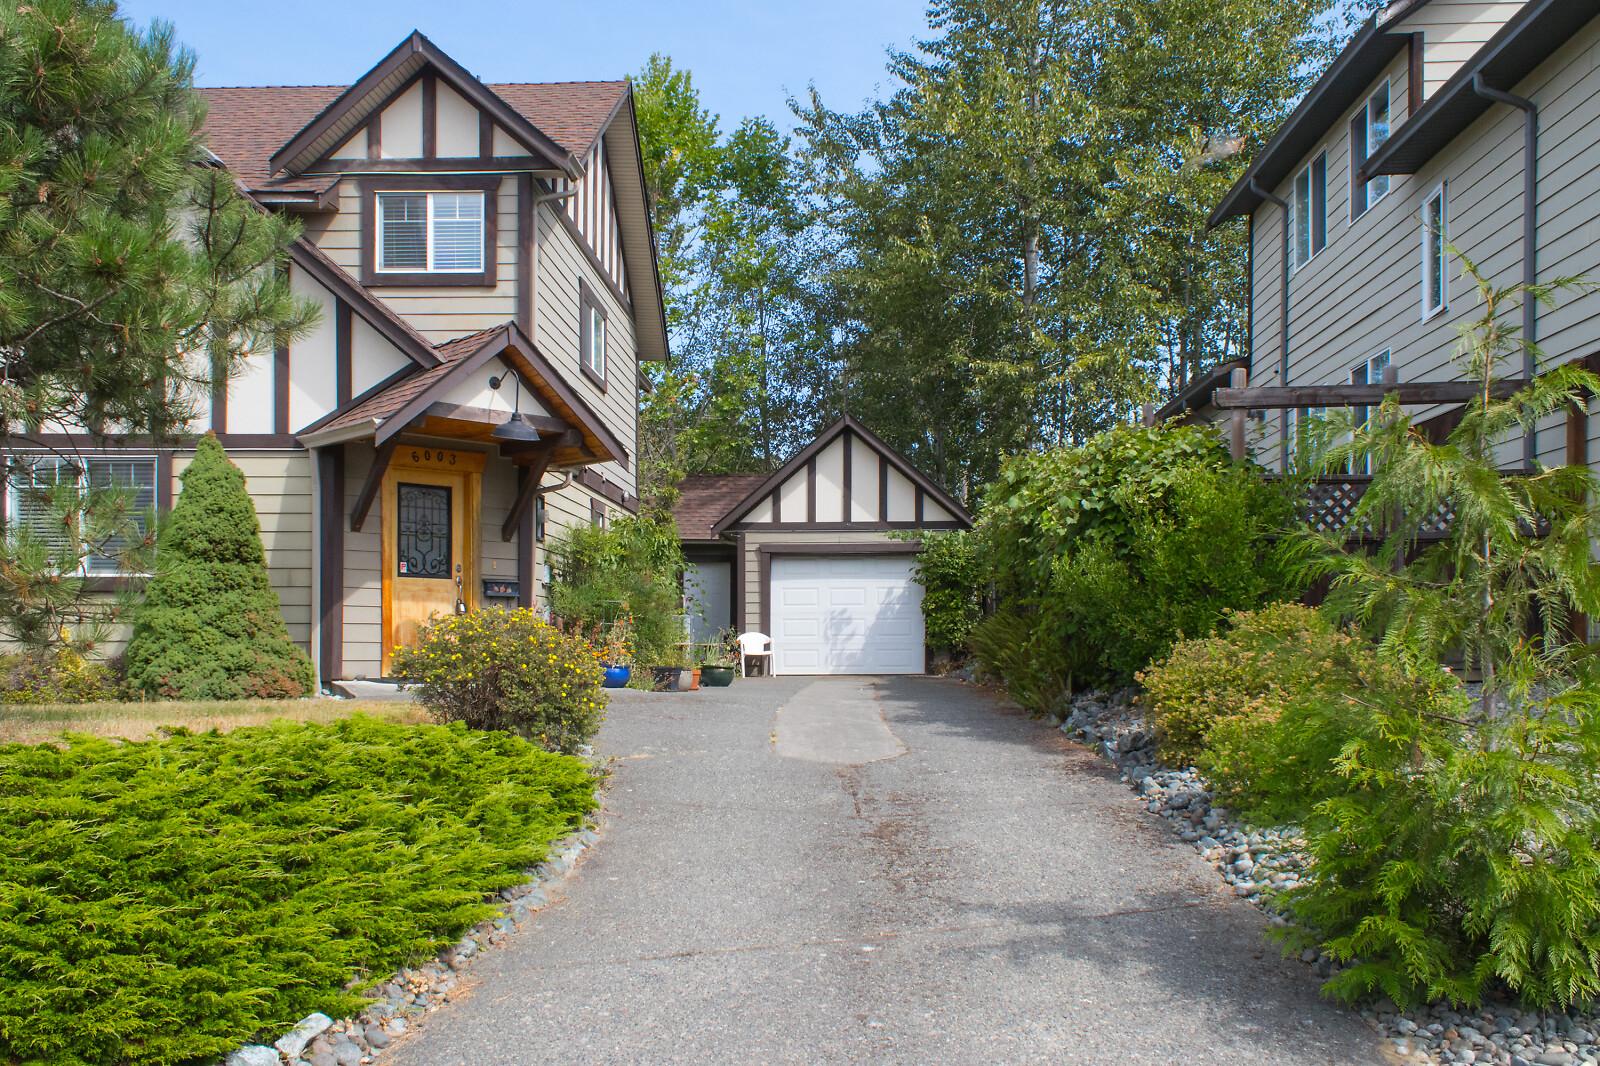 6003 Stonehaven Drive, Duncan, British Columbia  V9L 0A1 - Photo 4 - 885028